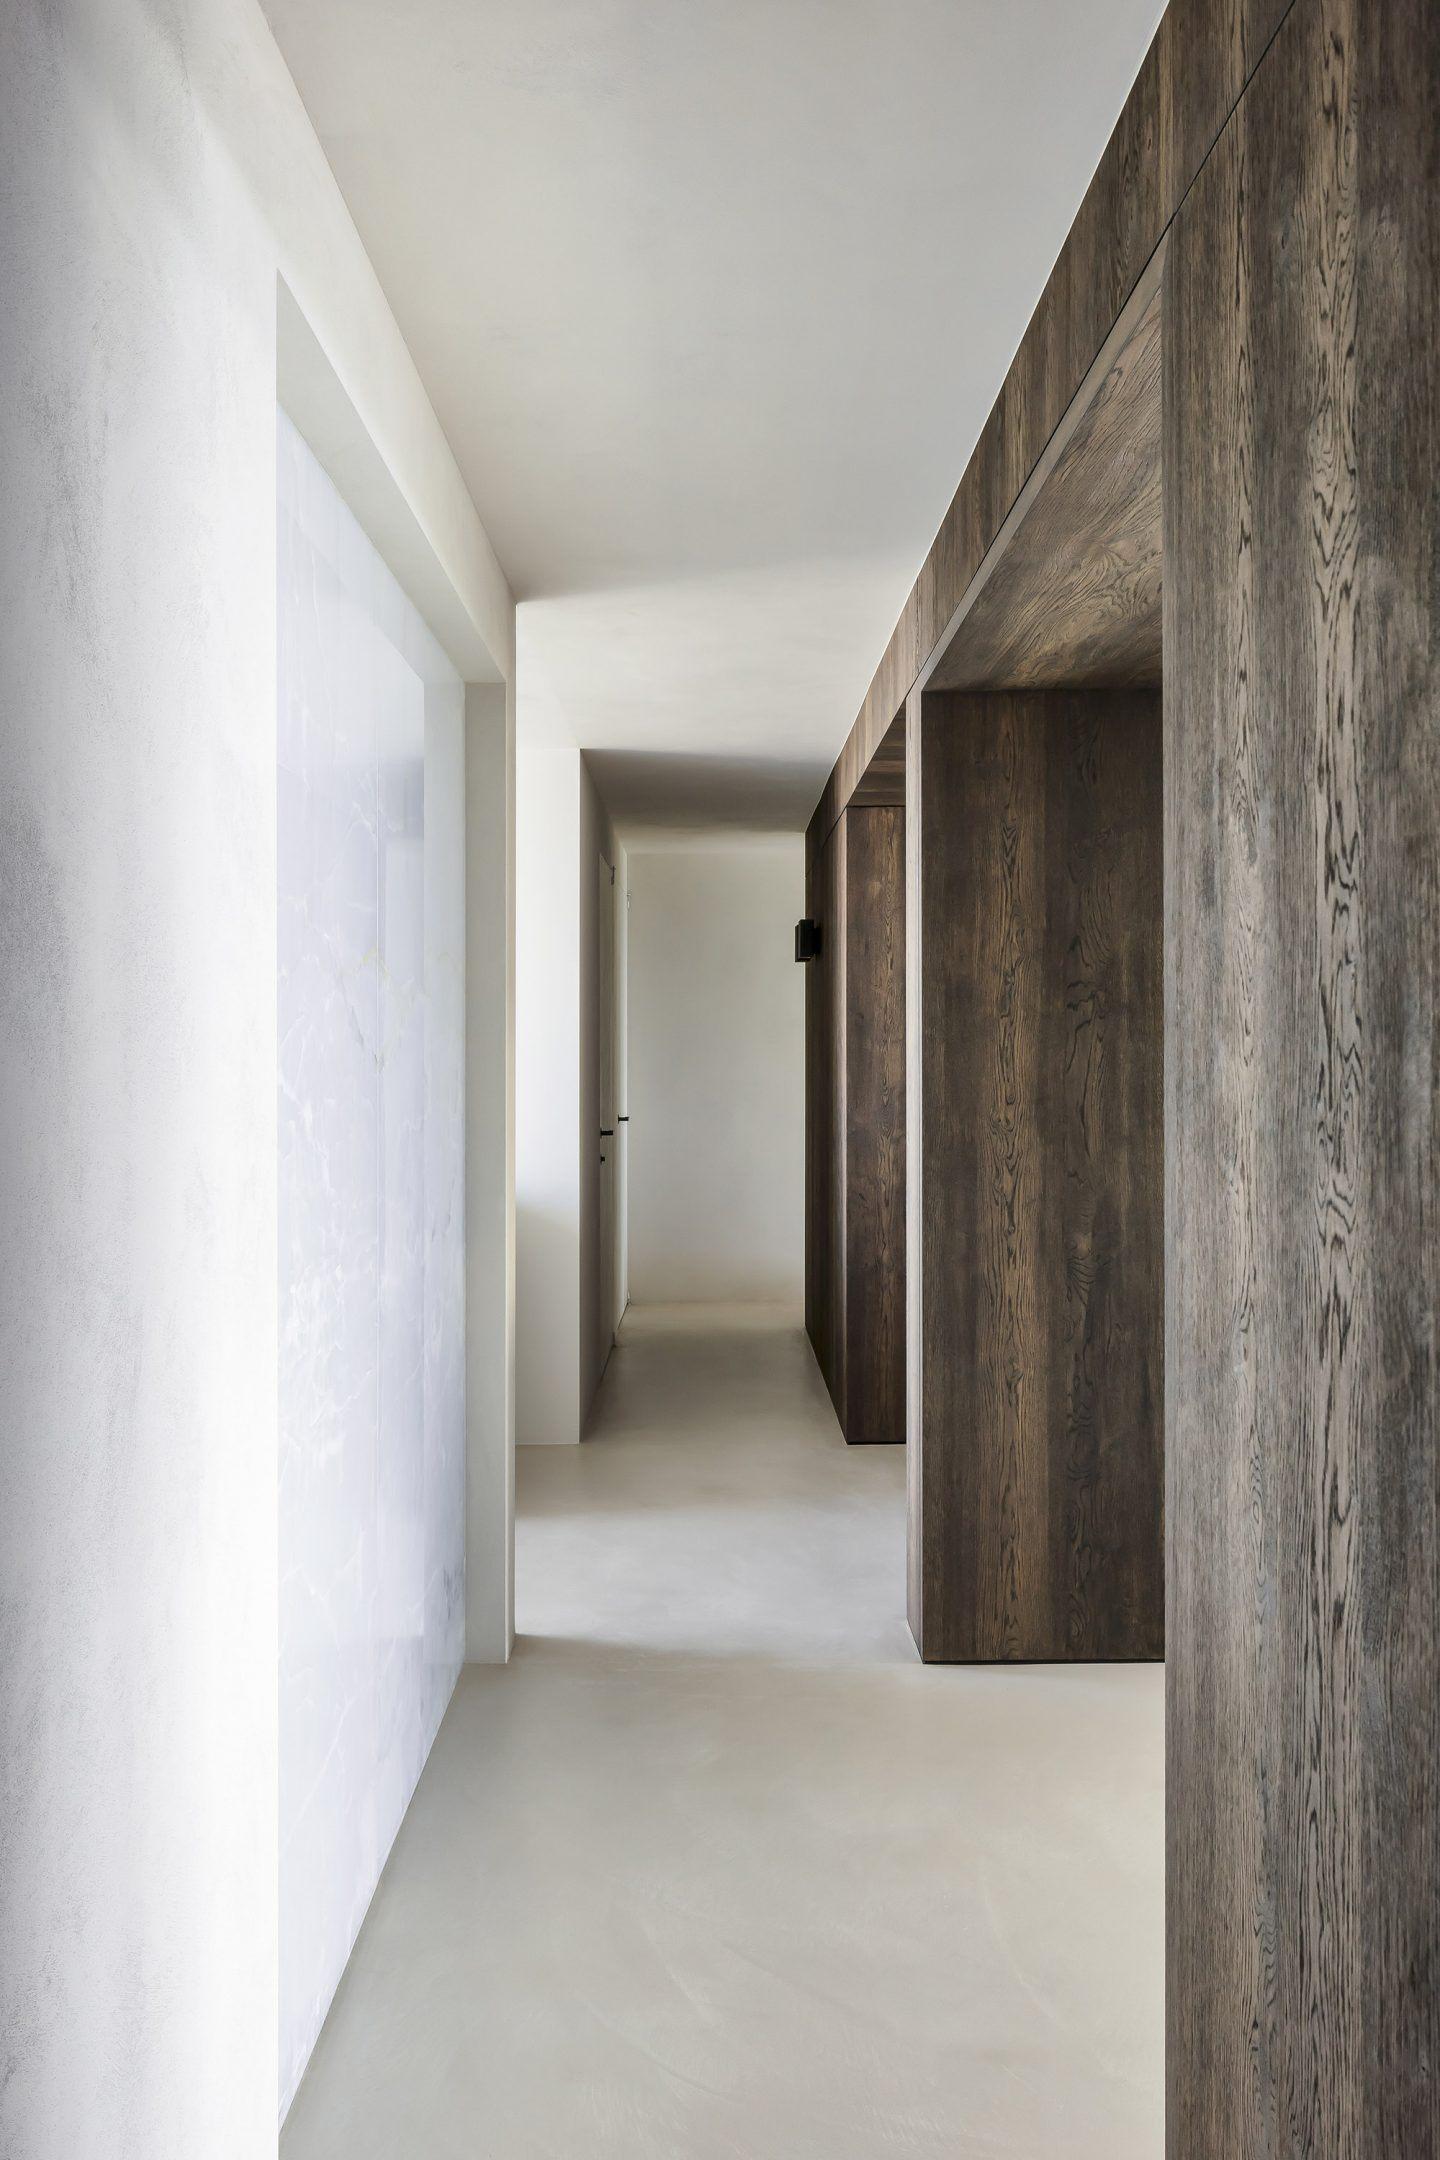 IGNANT-Architecture-Aarjan-de-Feyter-House-Ham-017